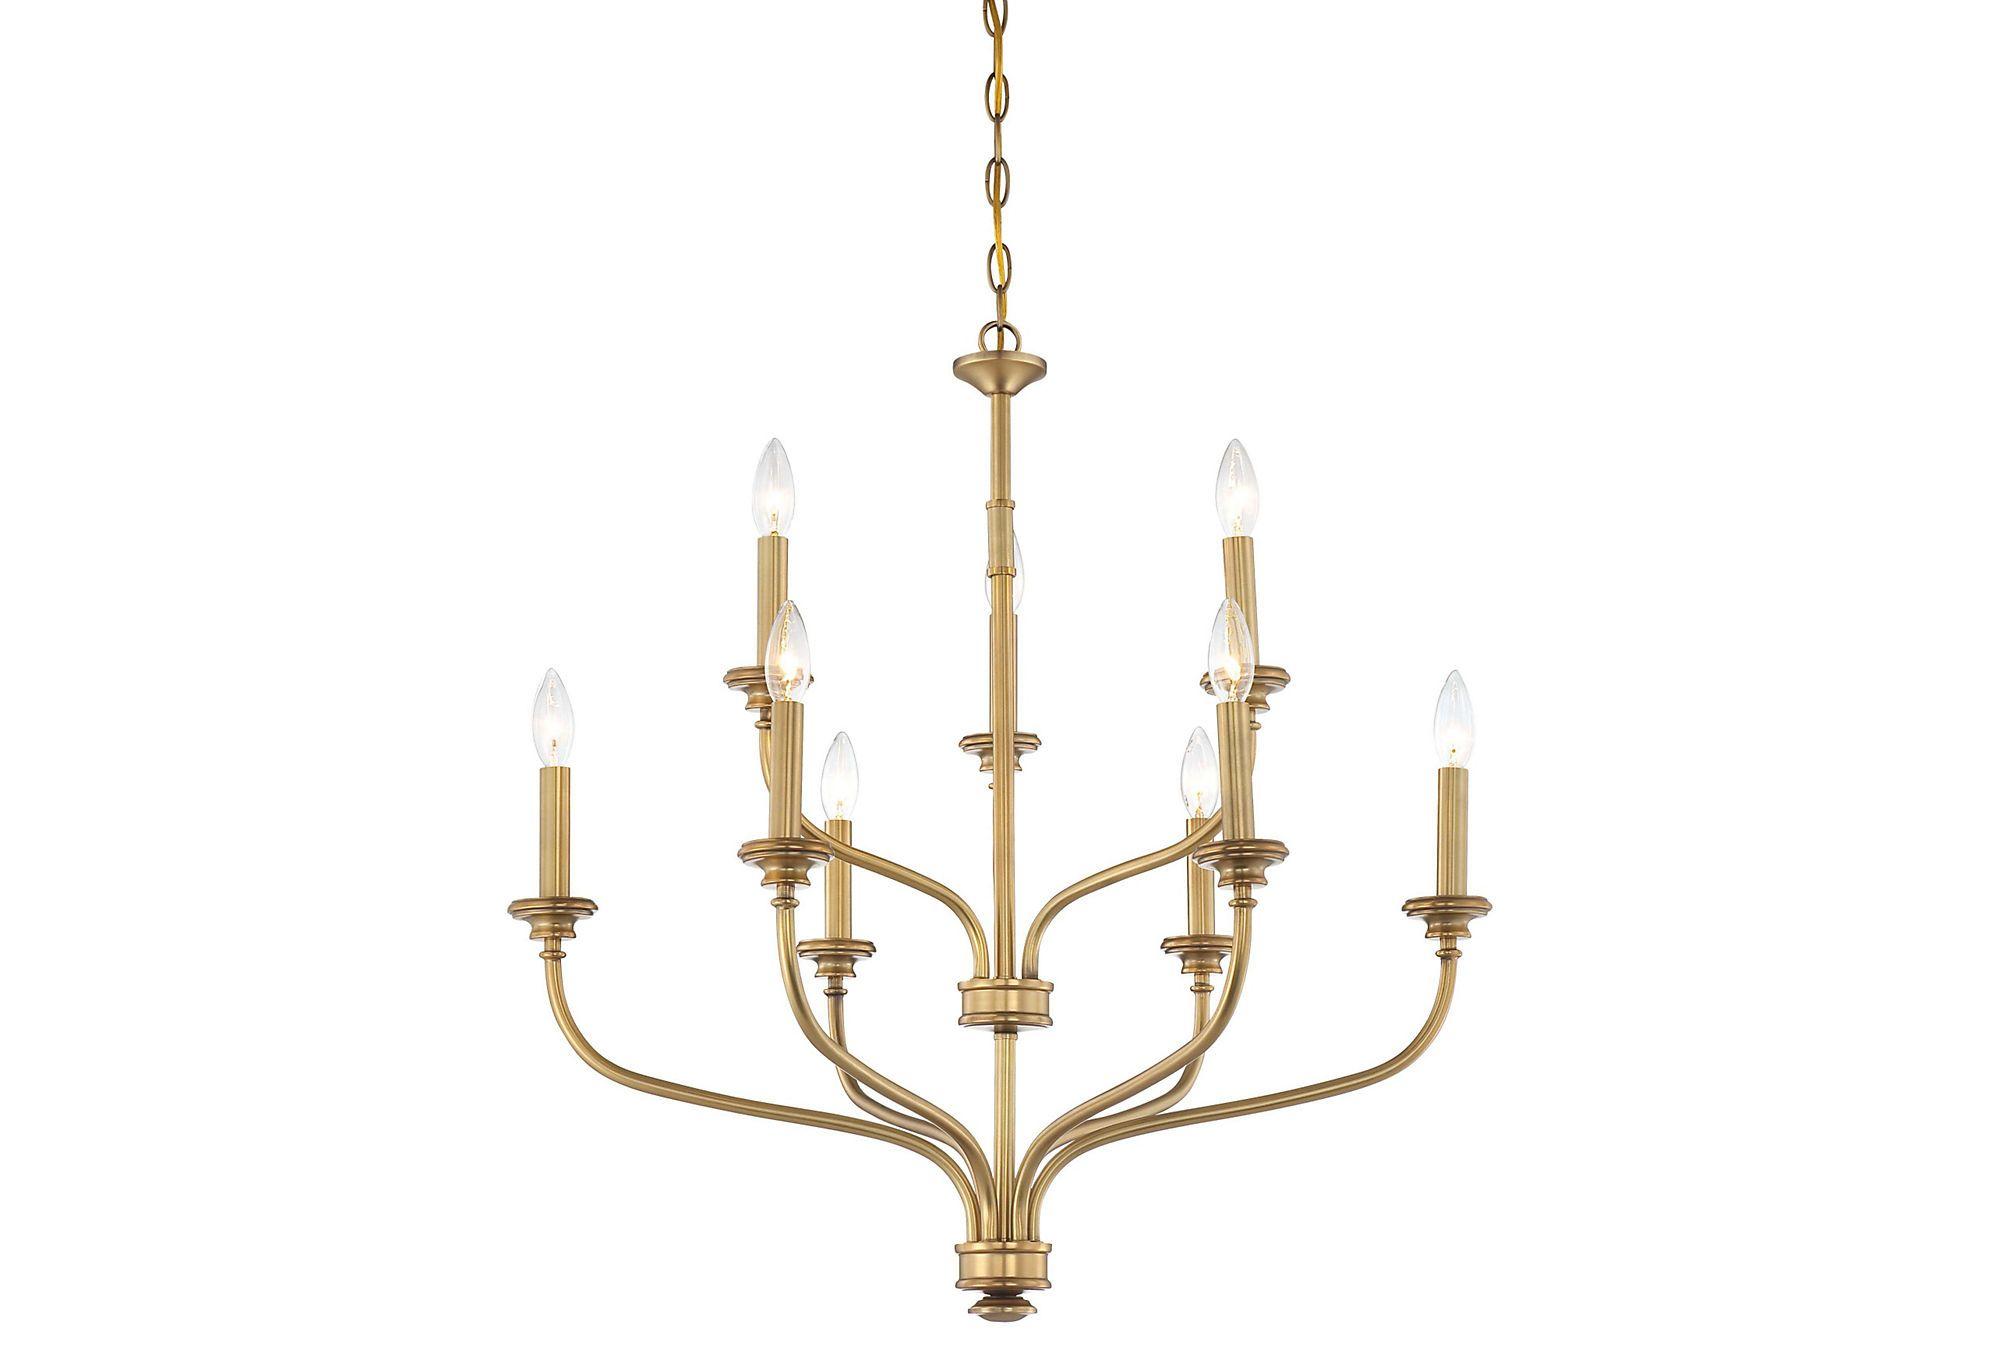 Sofia 9 light chandelier liberty gold illuminating options sofia 9 light chandelier liberty gold illuminating options one kings lane arubaitofo Images